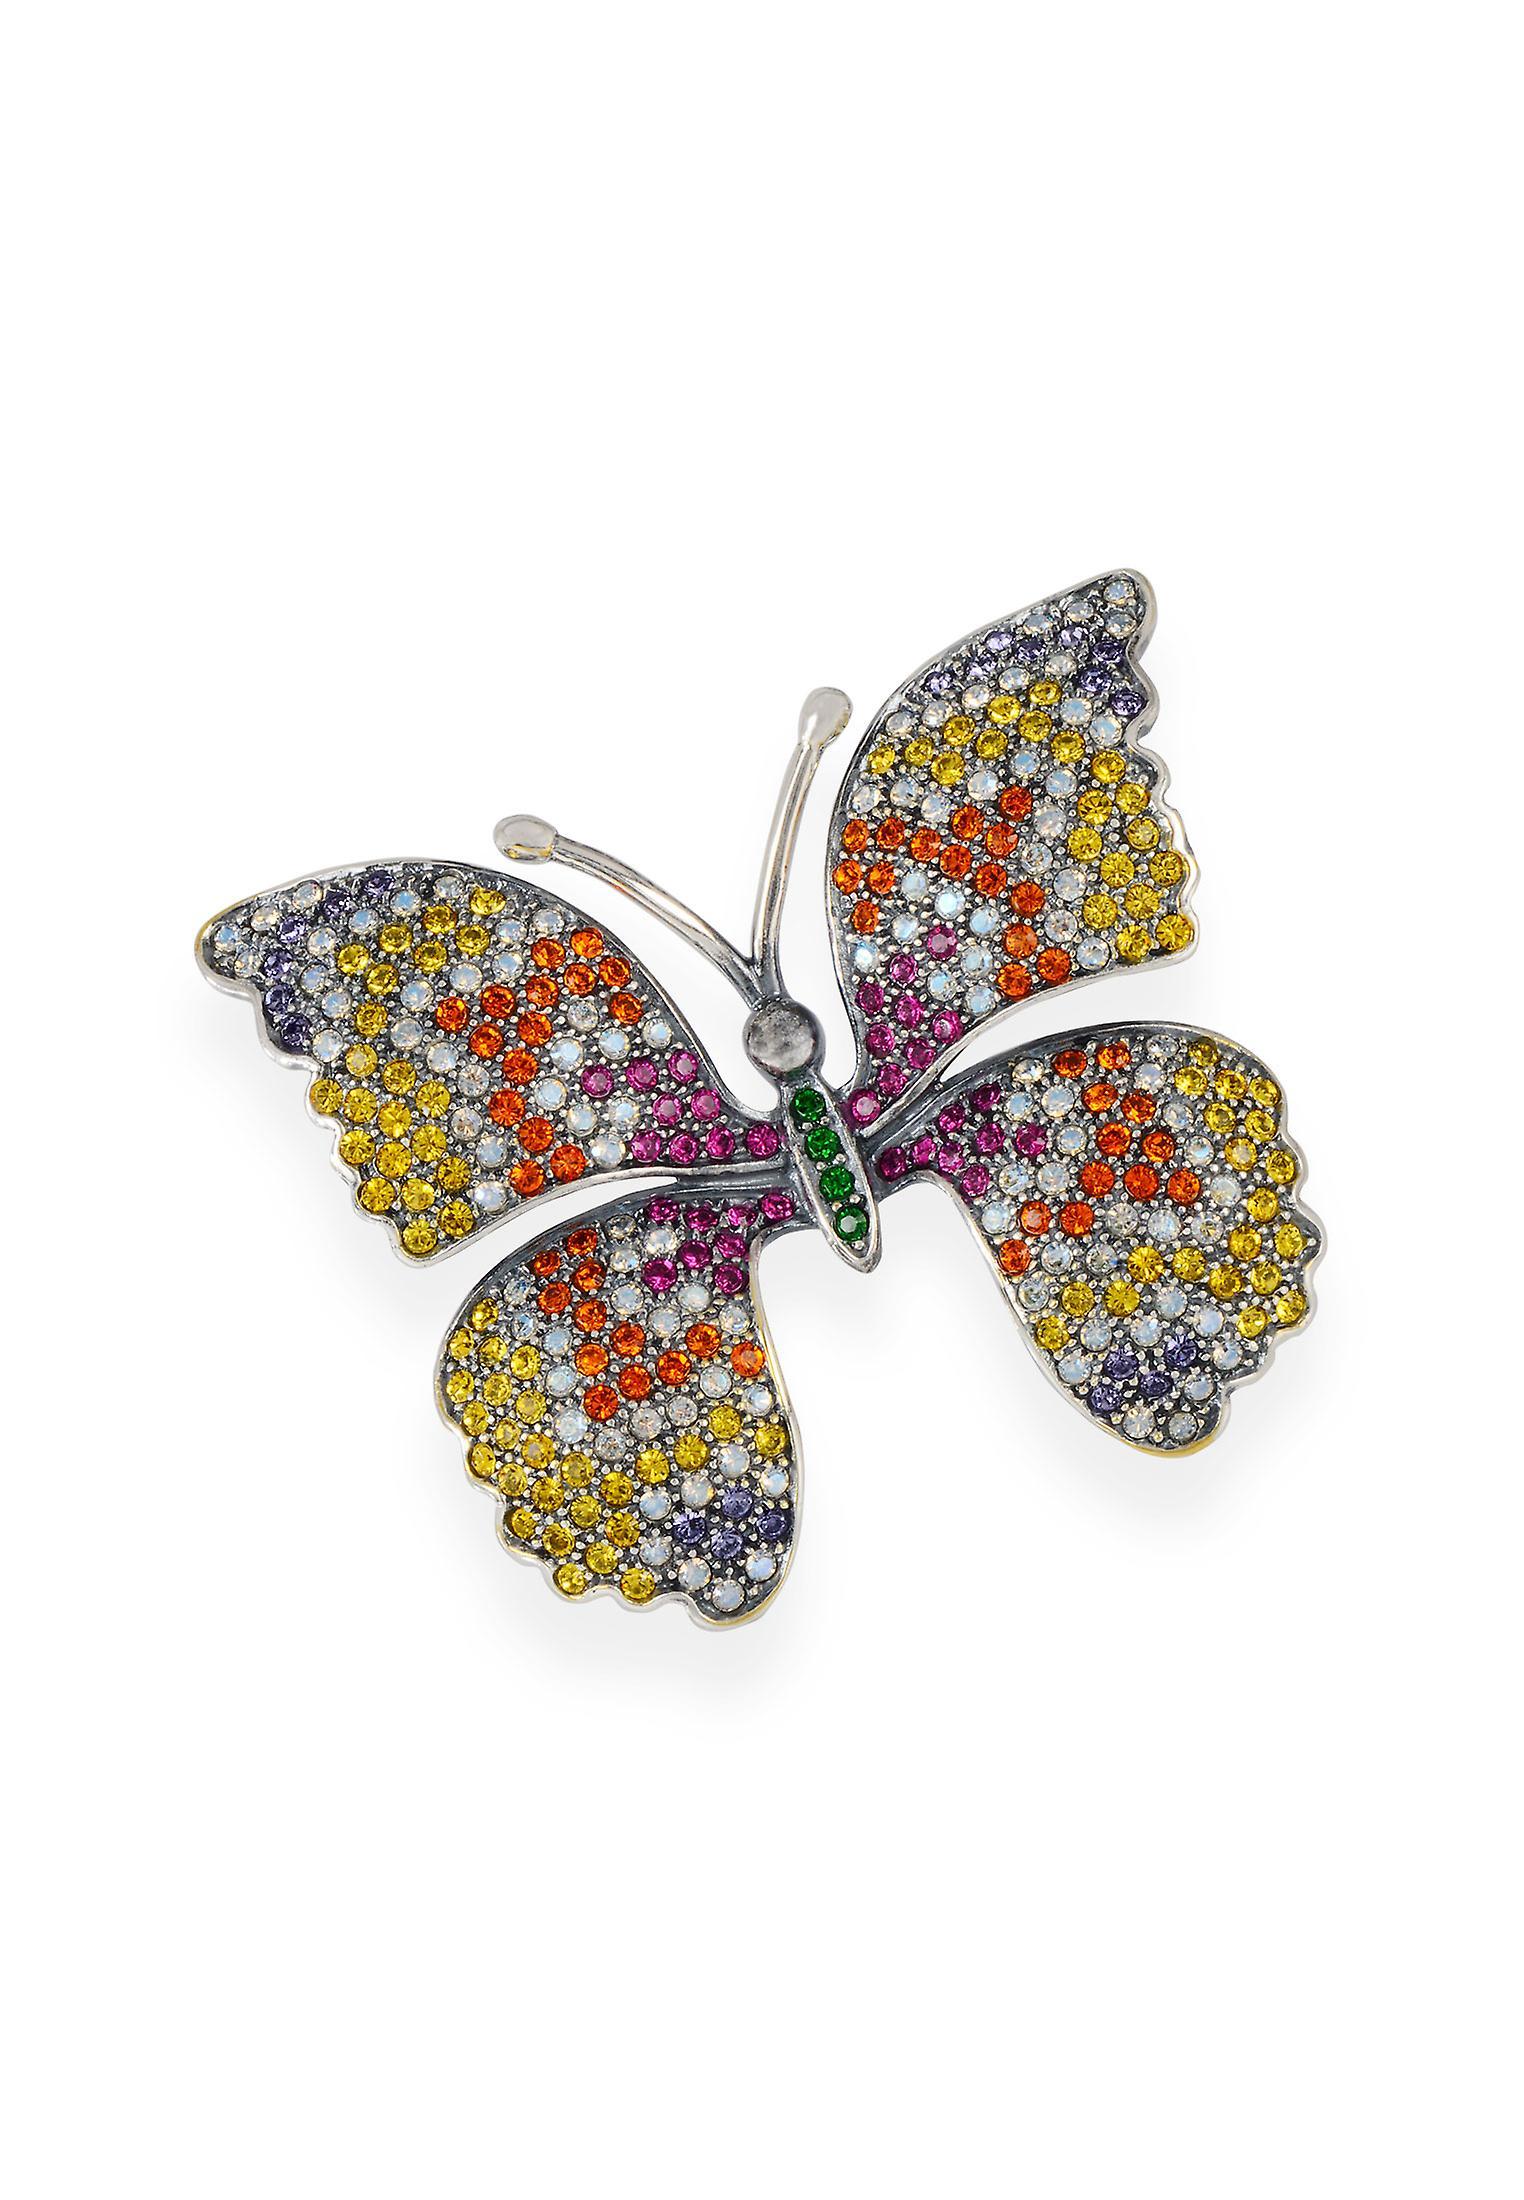 Multicolor brooch with crystals from Swarovski 7108